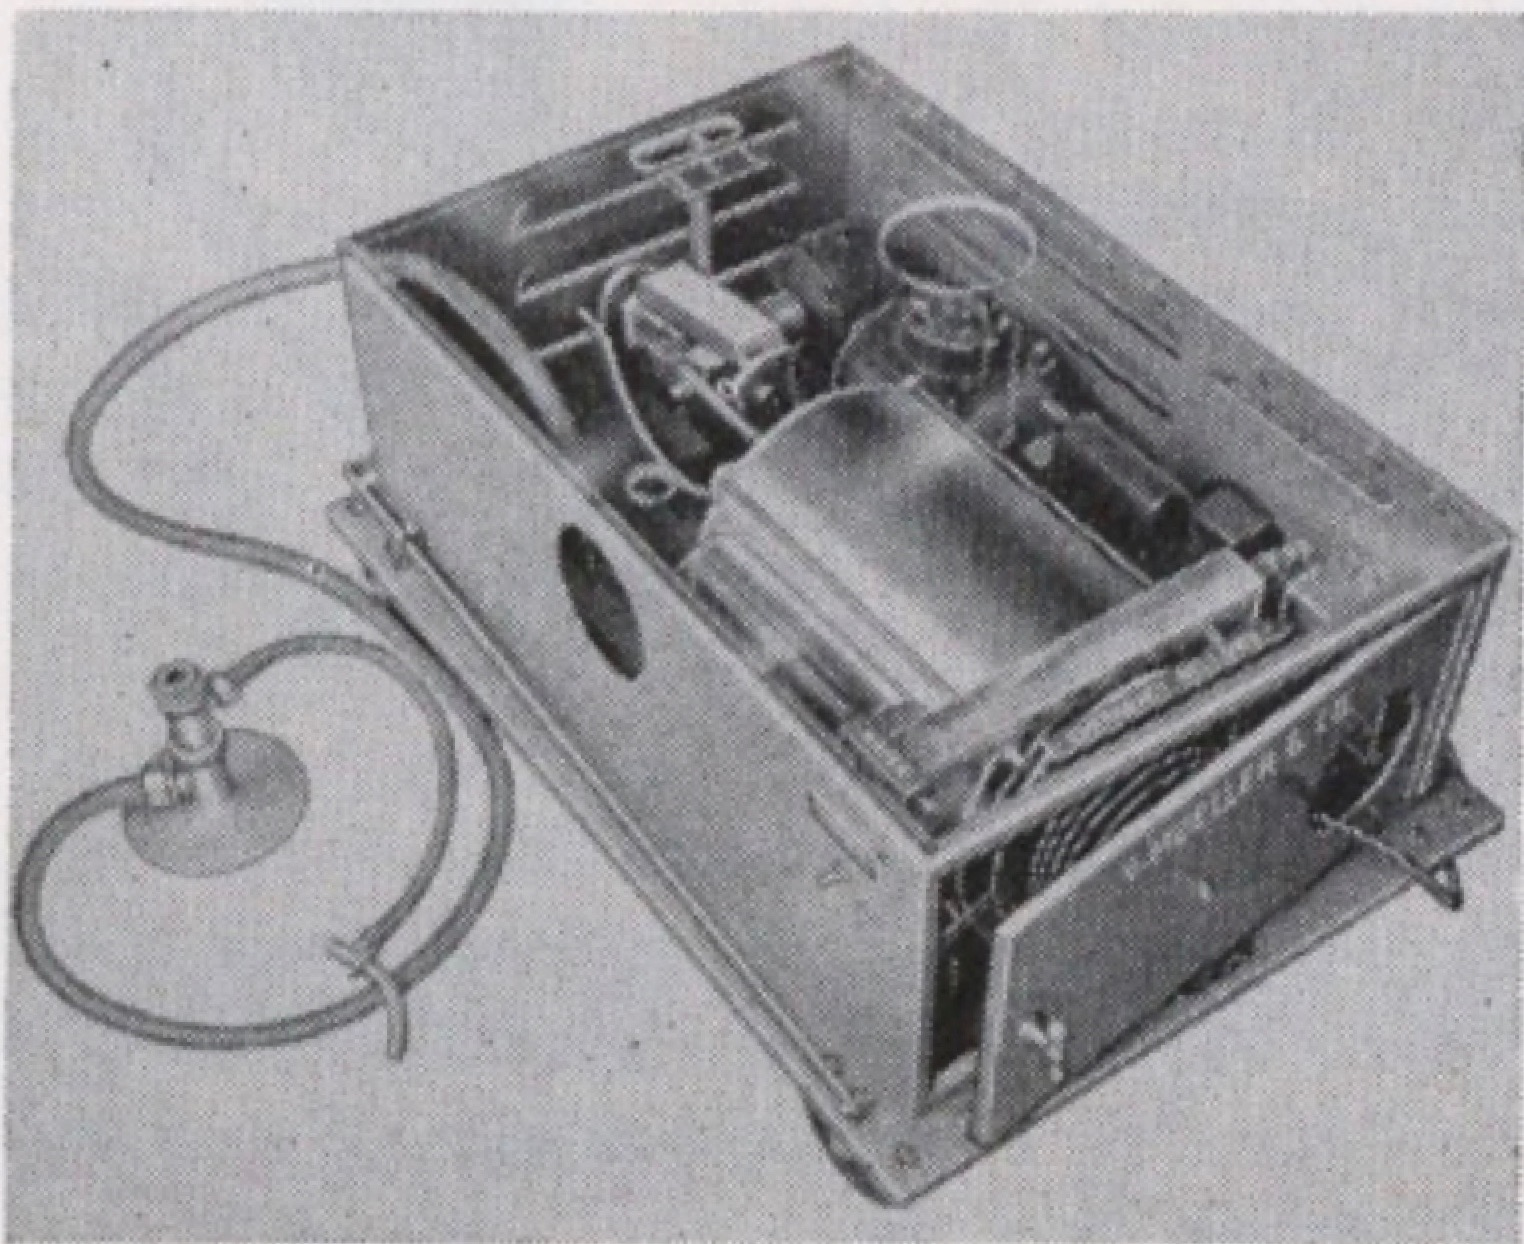 Morch Respirator